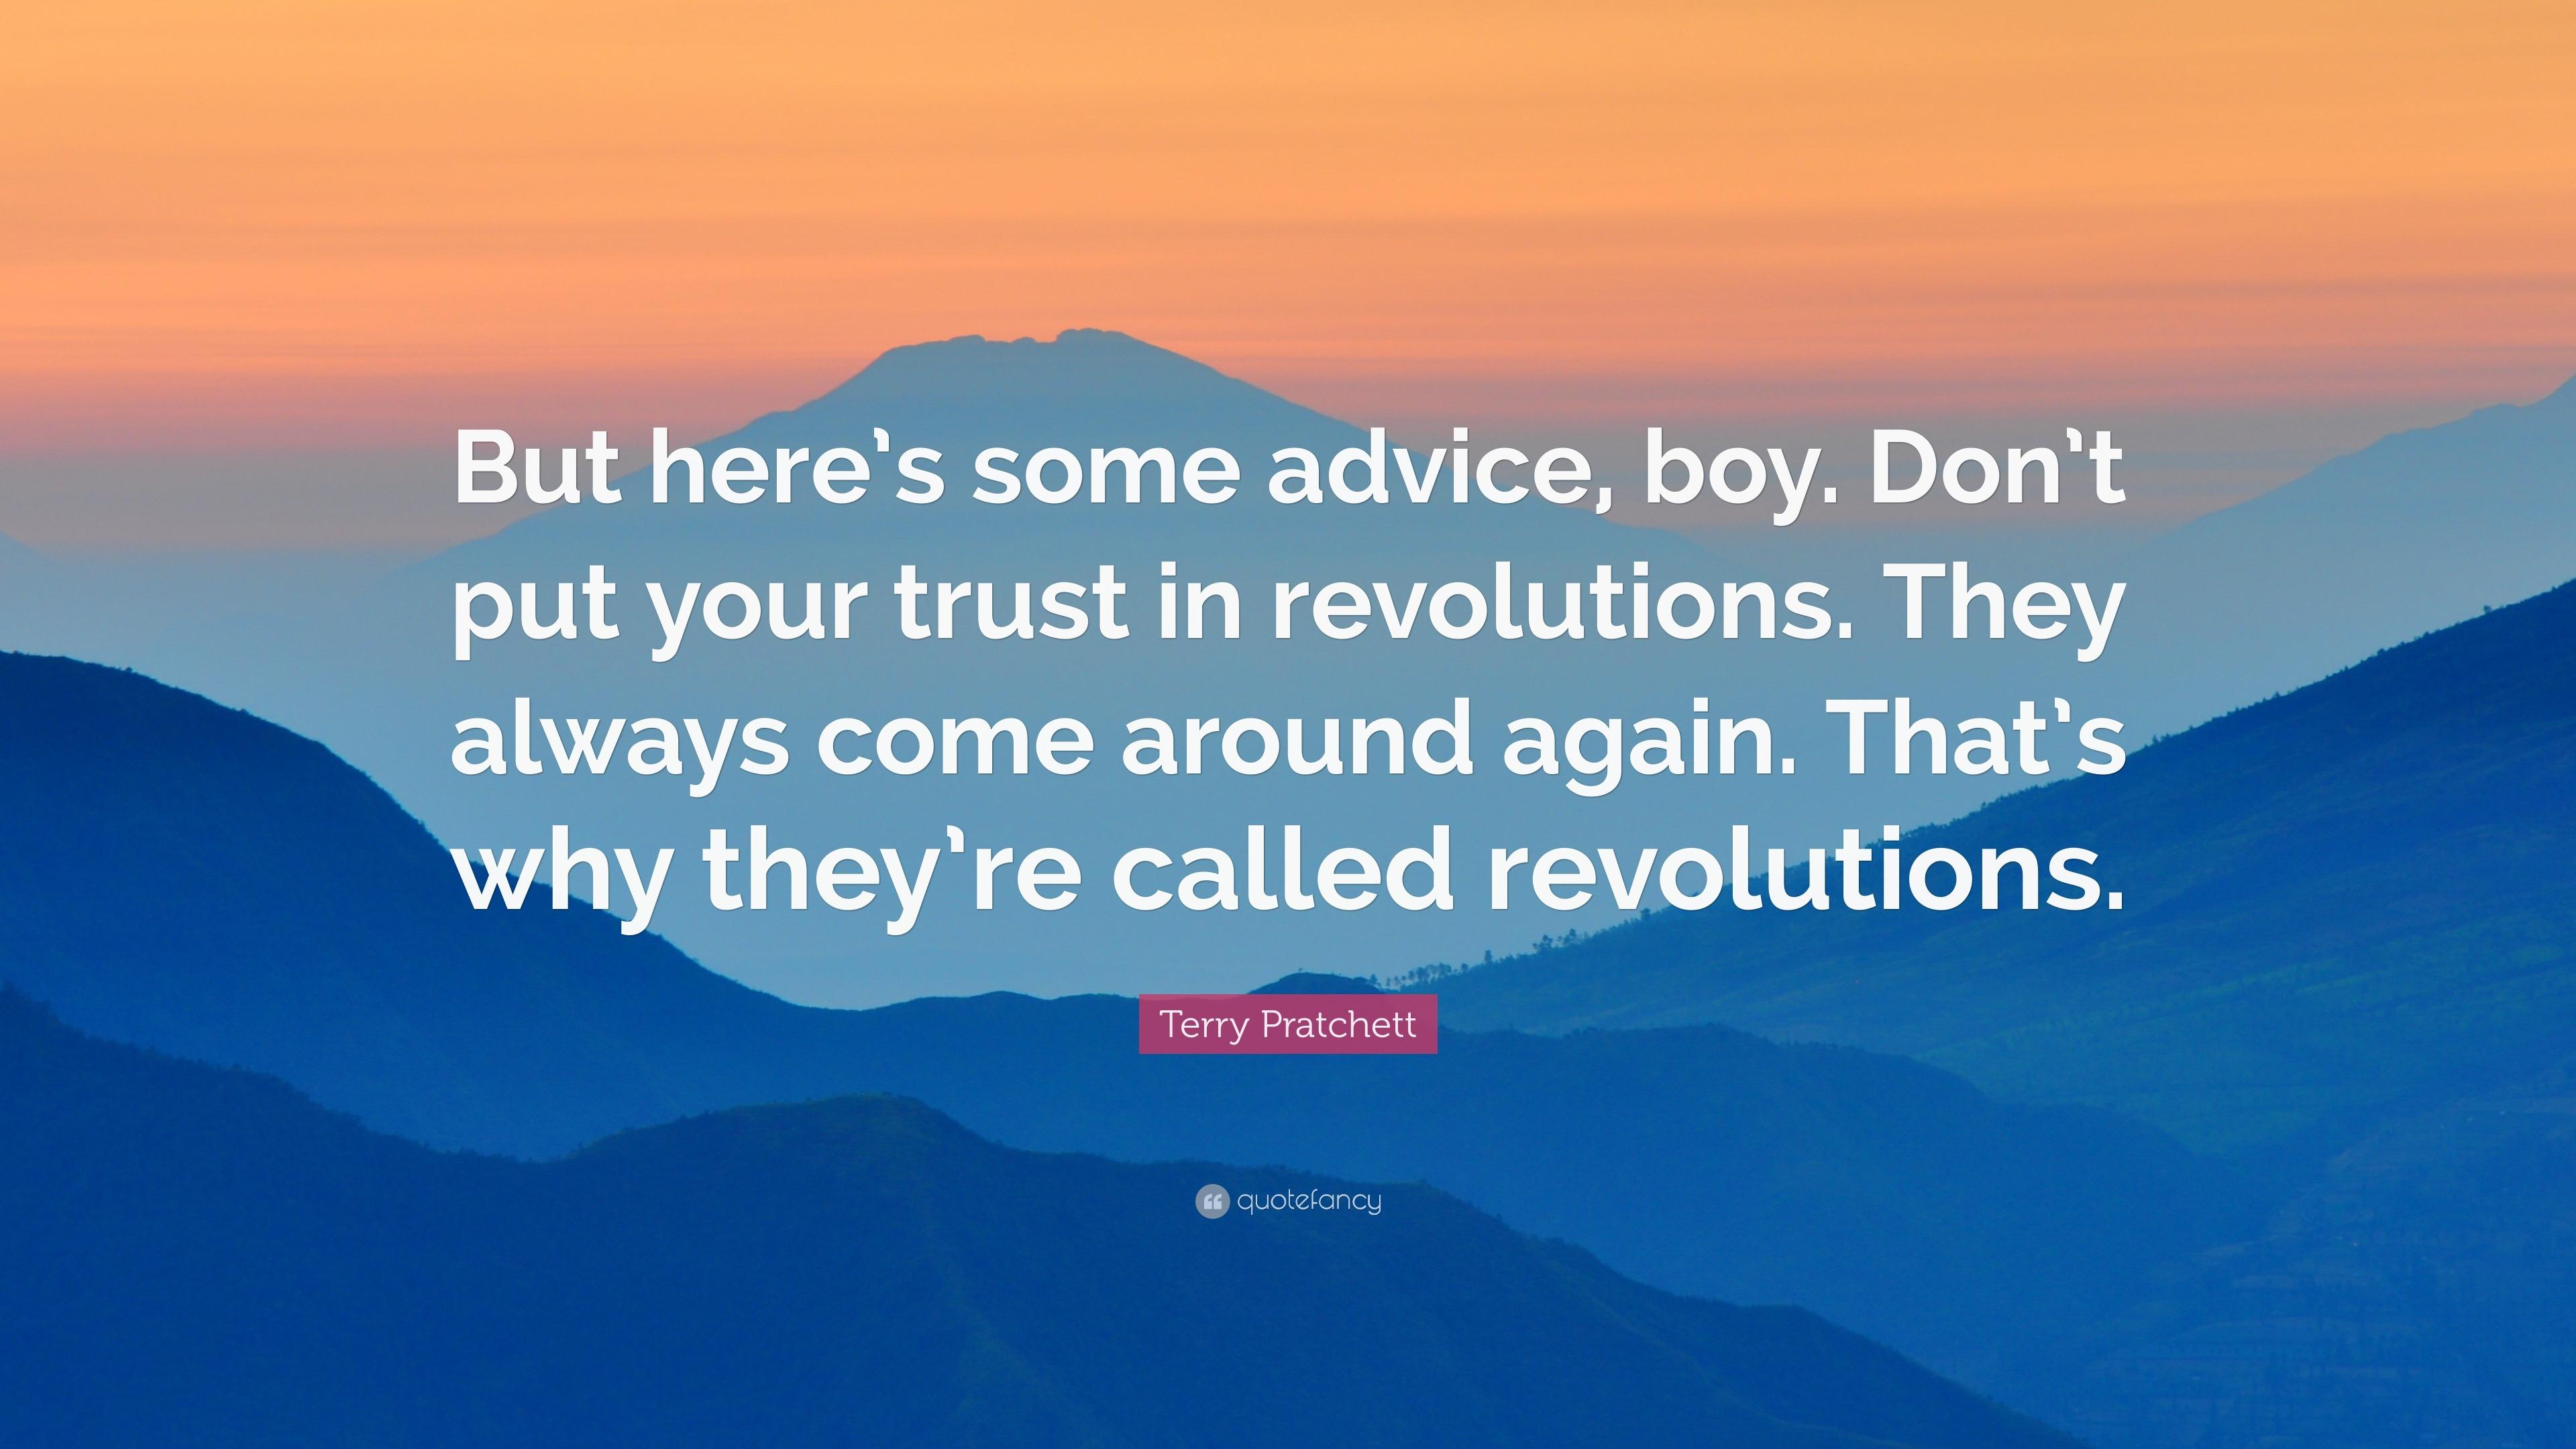 Terry Pratchett Quotes (100 wallpapers) - Quotefancy